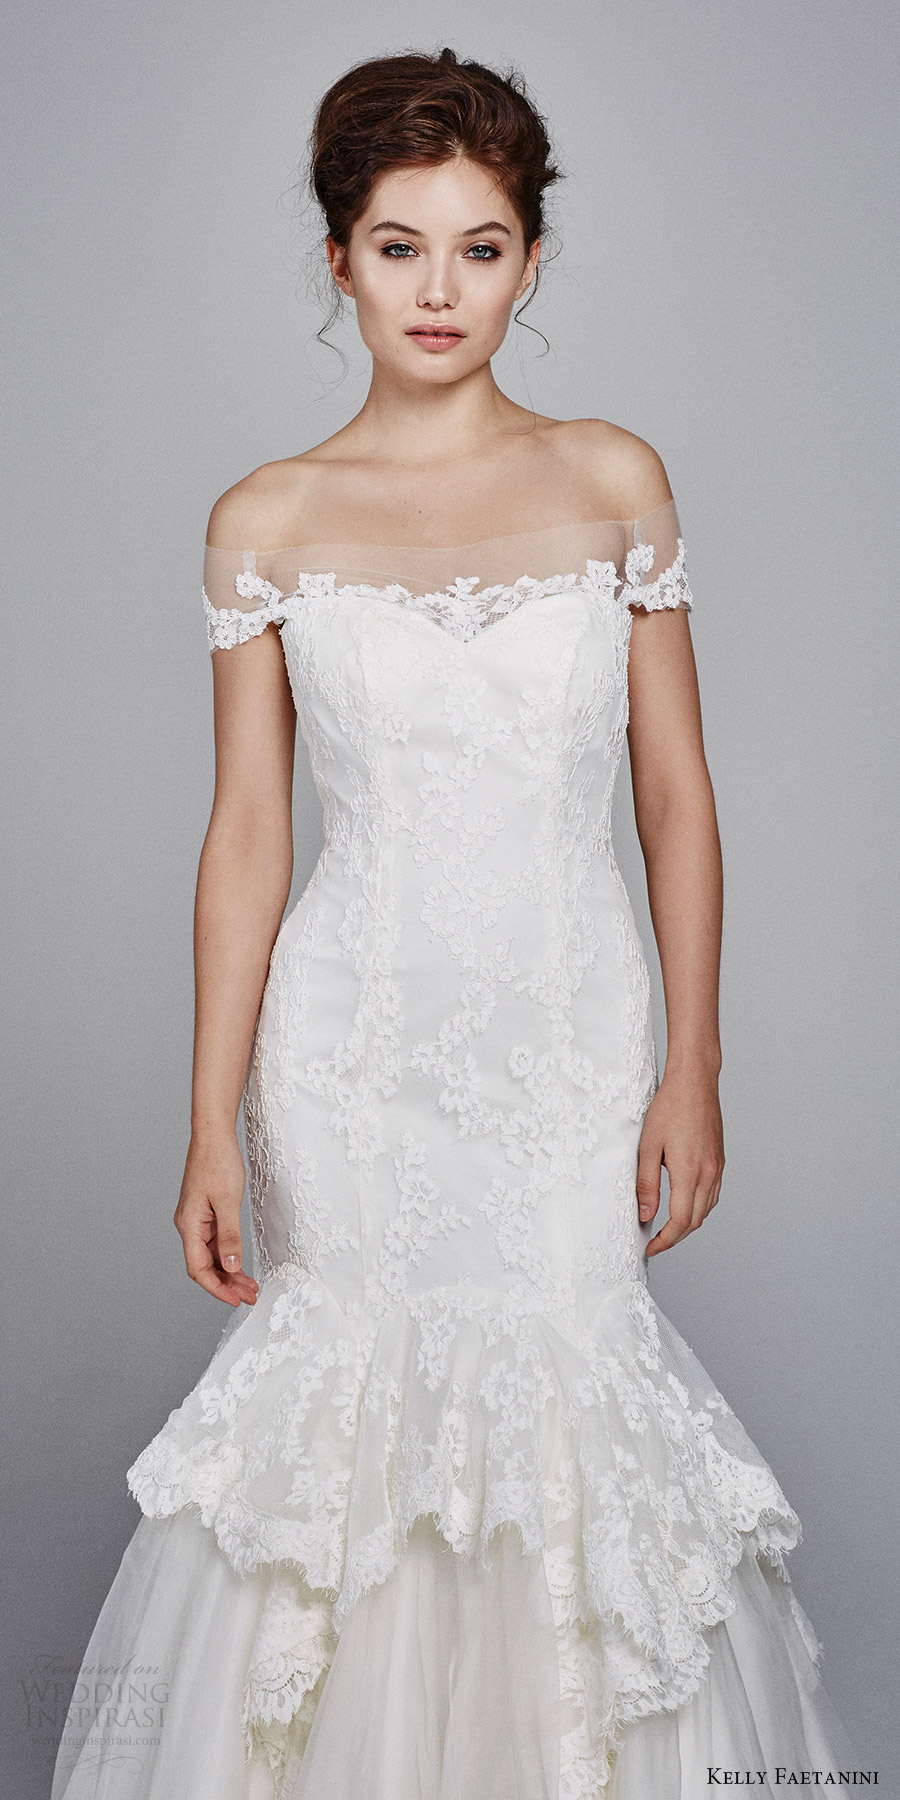 Mermaid Sweetheart Lace Wedding Dress 93 Ideal kelly faetanini bridal fall